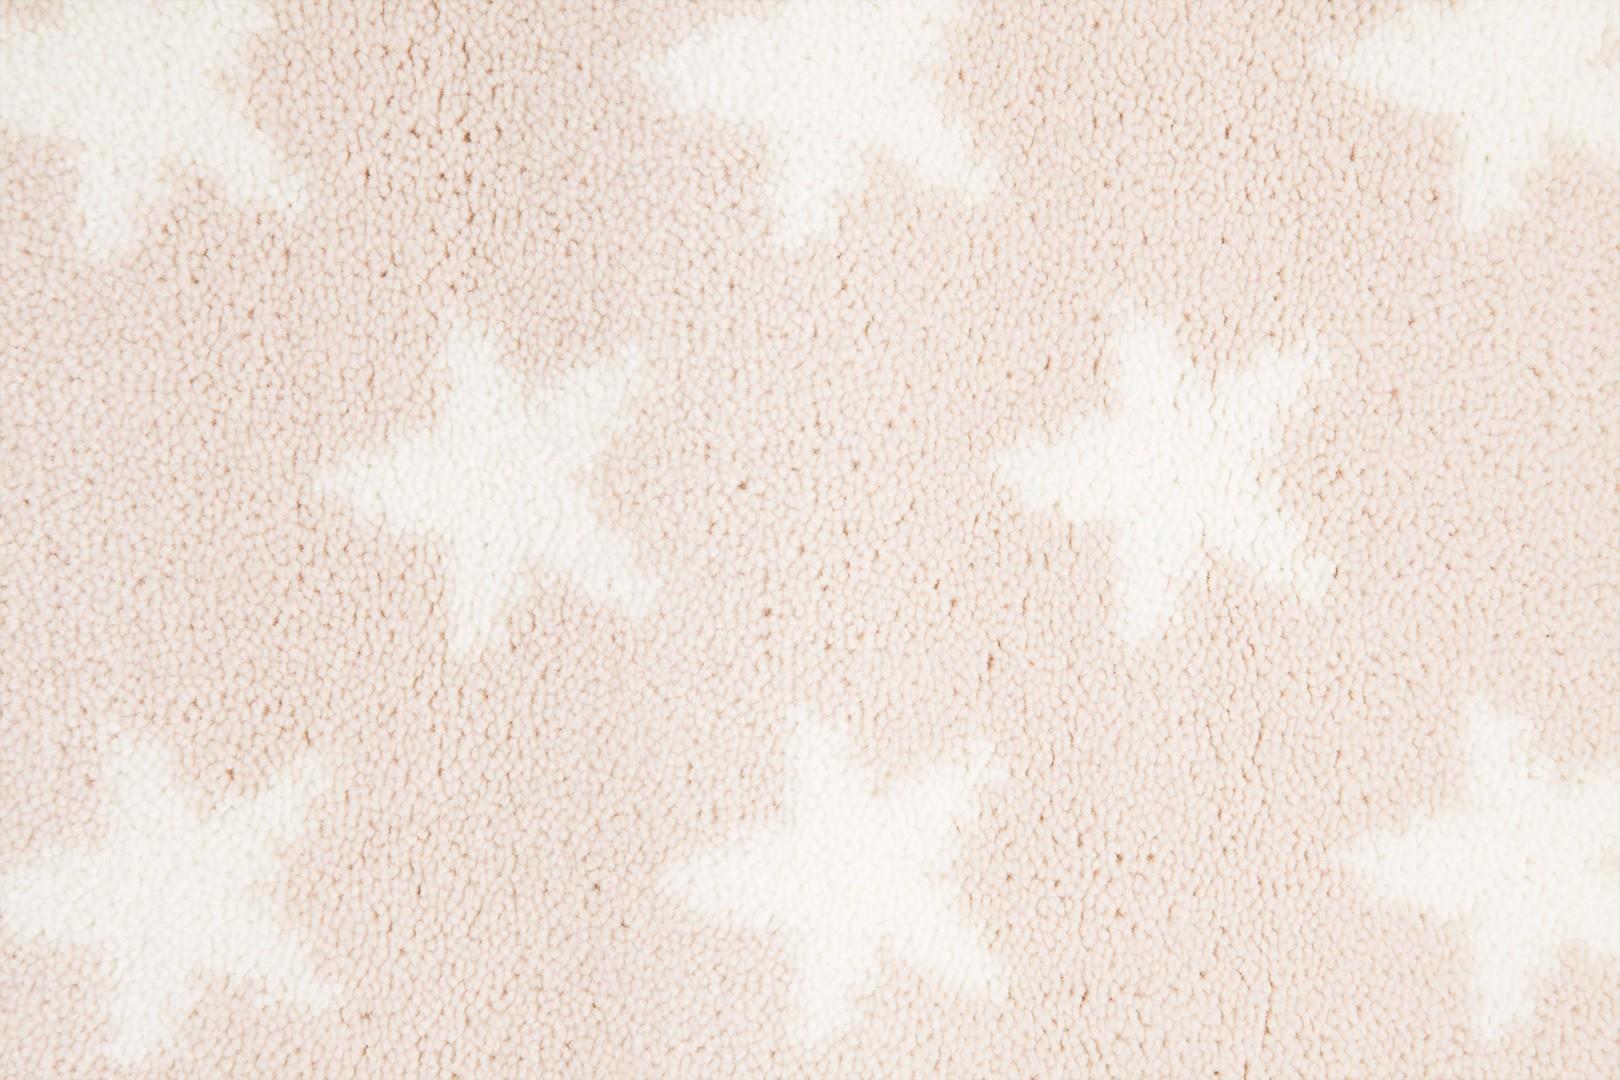 tapis pour chambre de b b rose estrellitas lorena canals. Black Bedroom Furniture Sets. Home Design Ideas